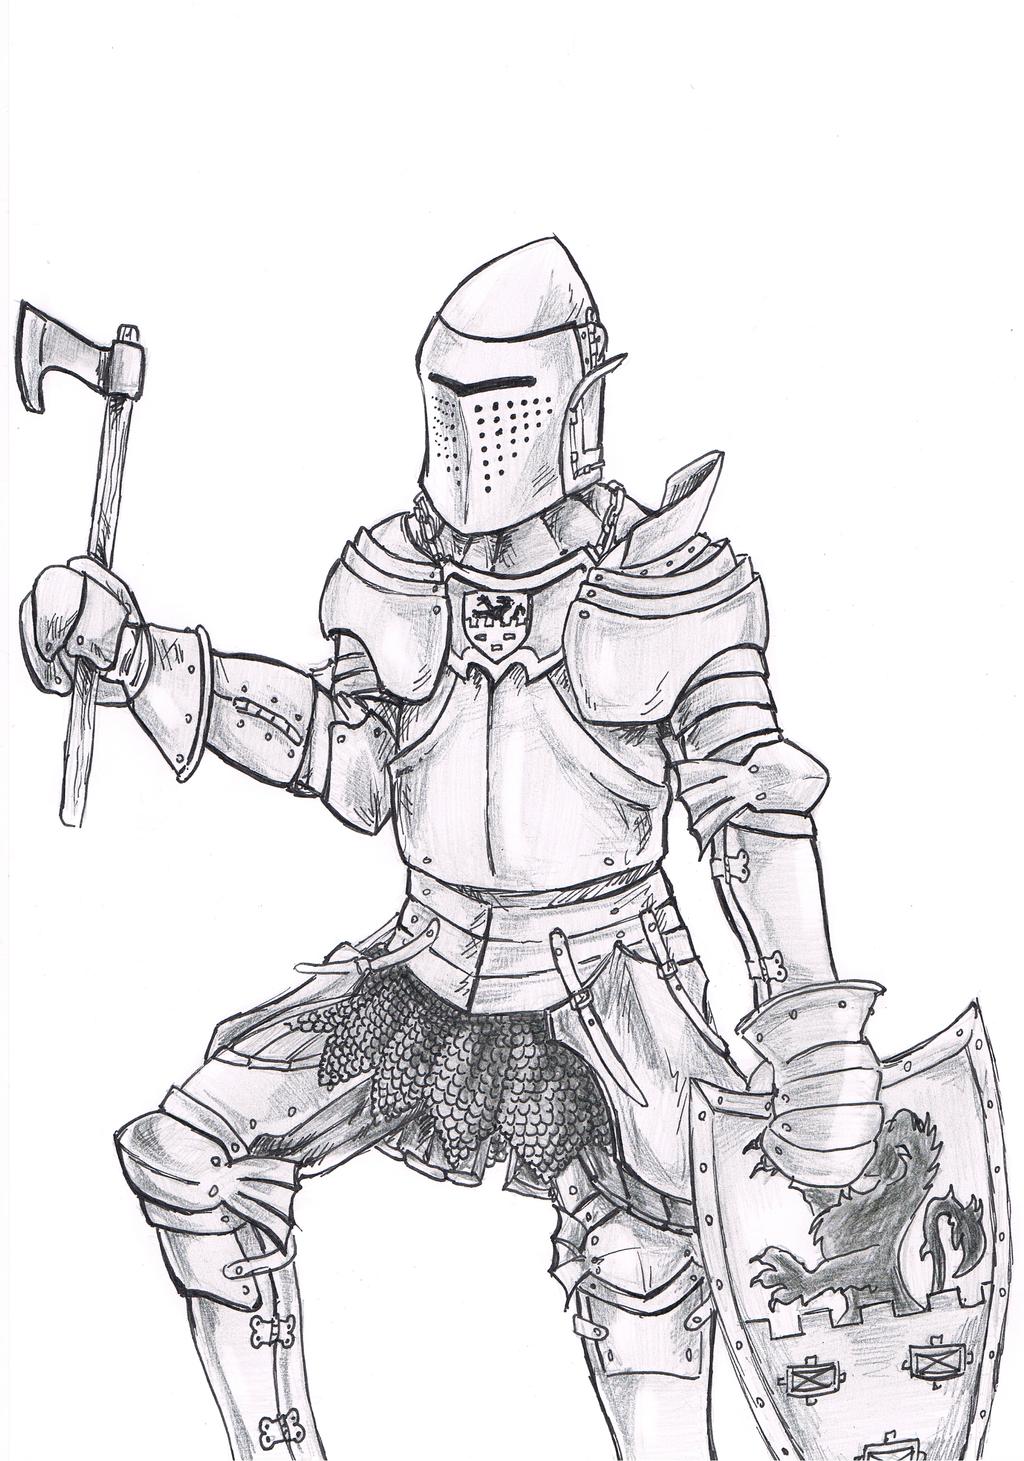 Project Knight Armor Xiv Century Jurdasz